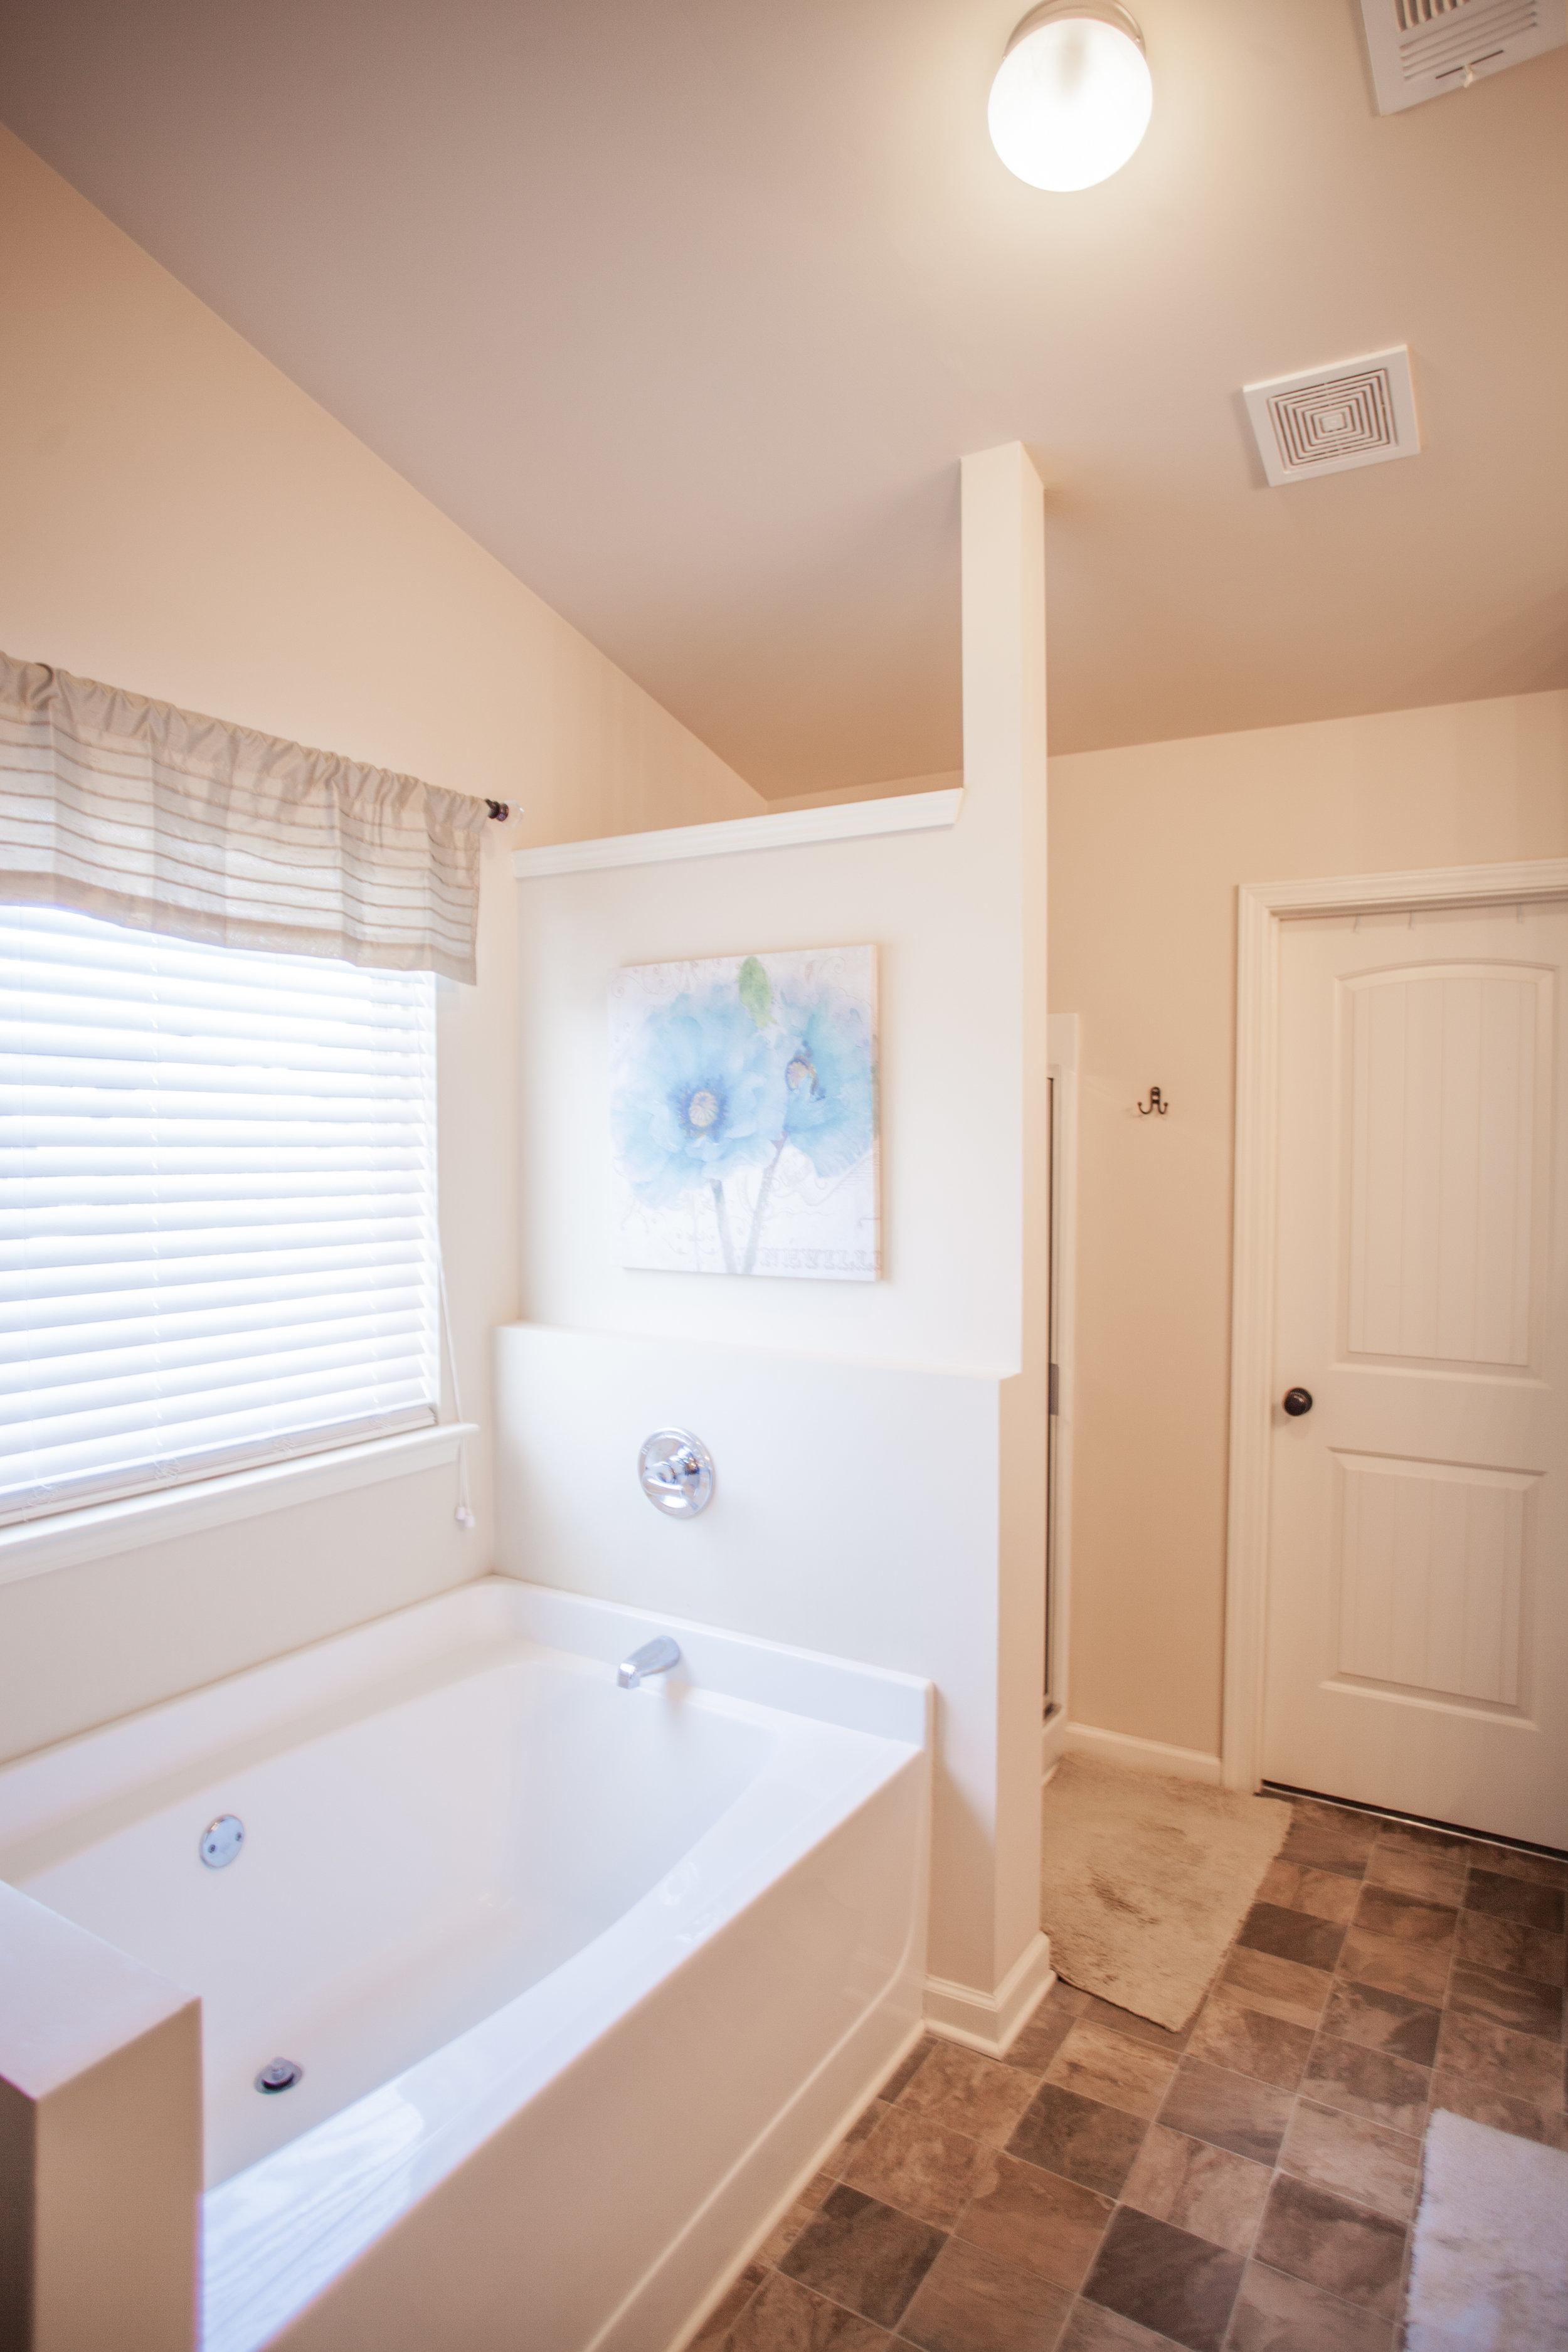 woodstock-ga-house-for-sale-wingard-real-estate-under-300k-21.jpg